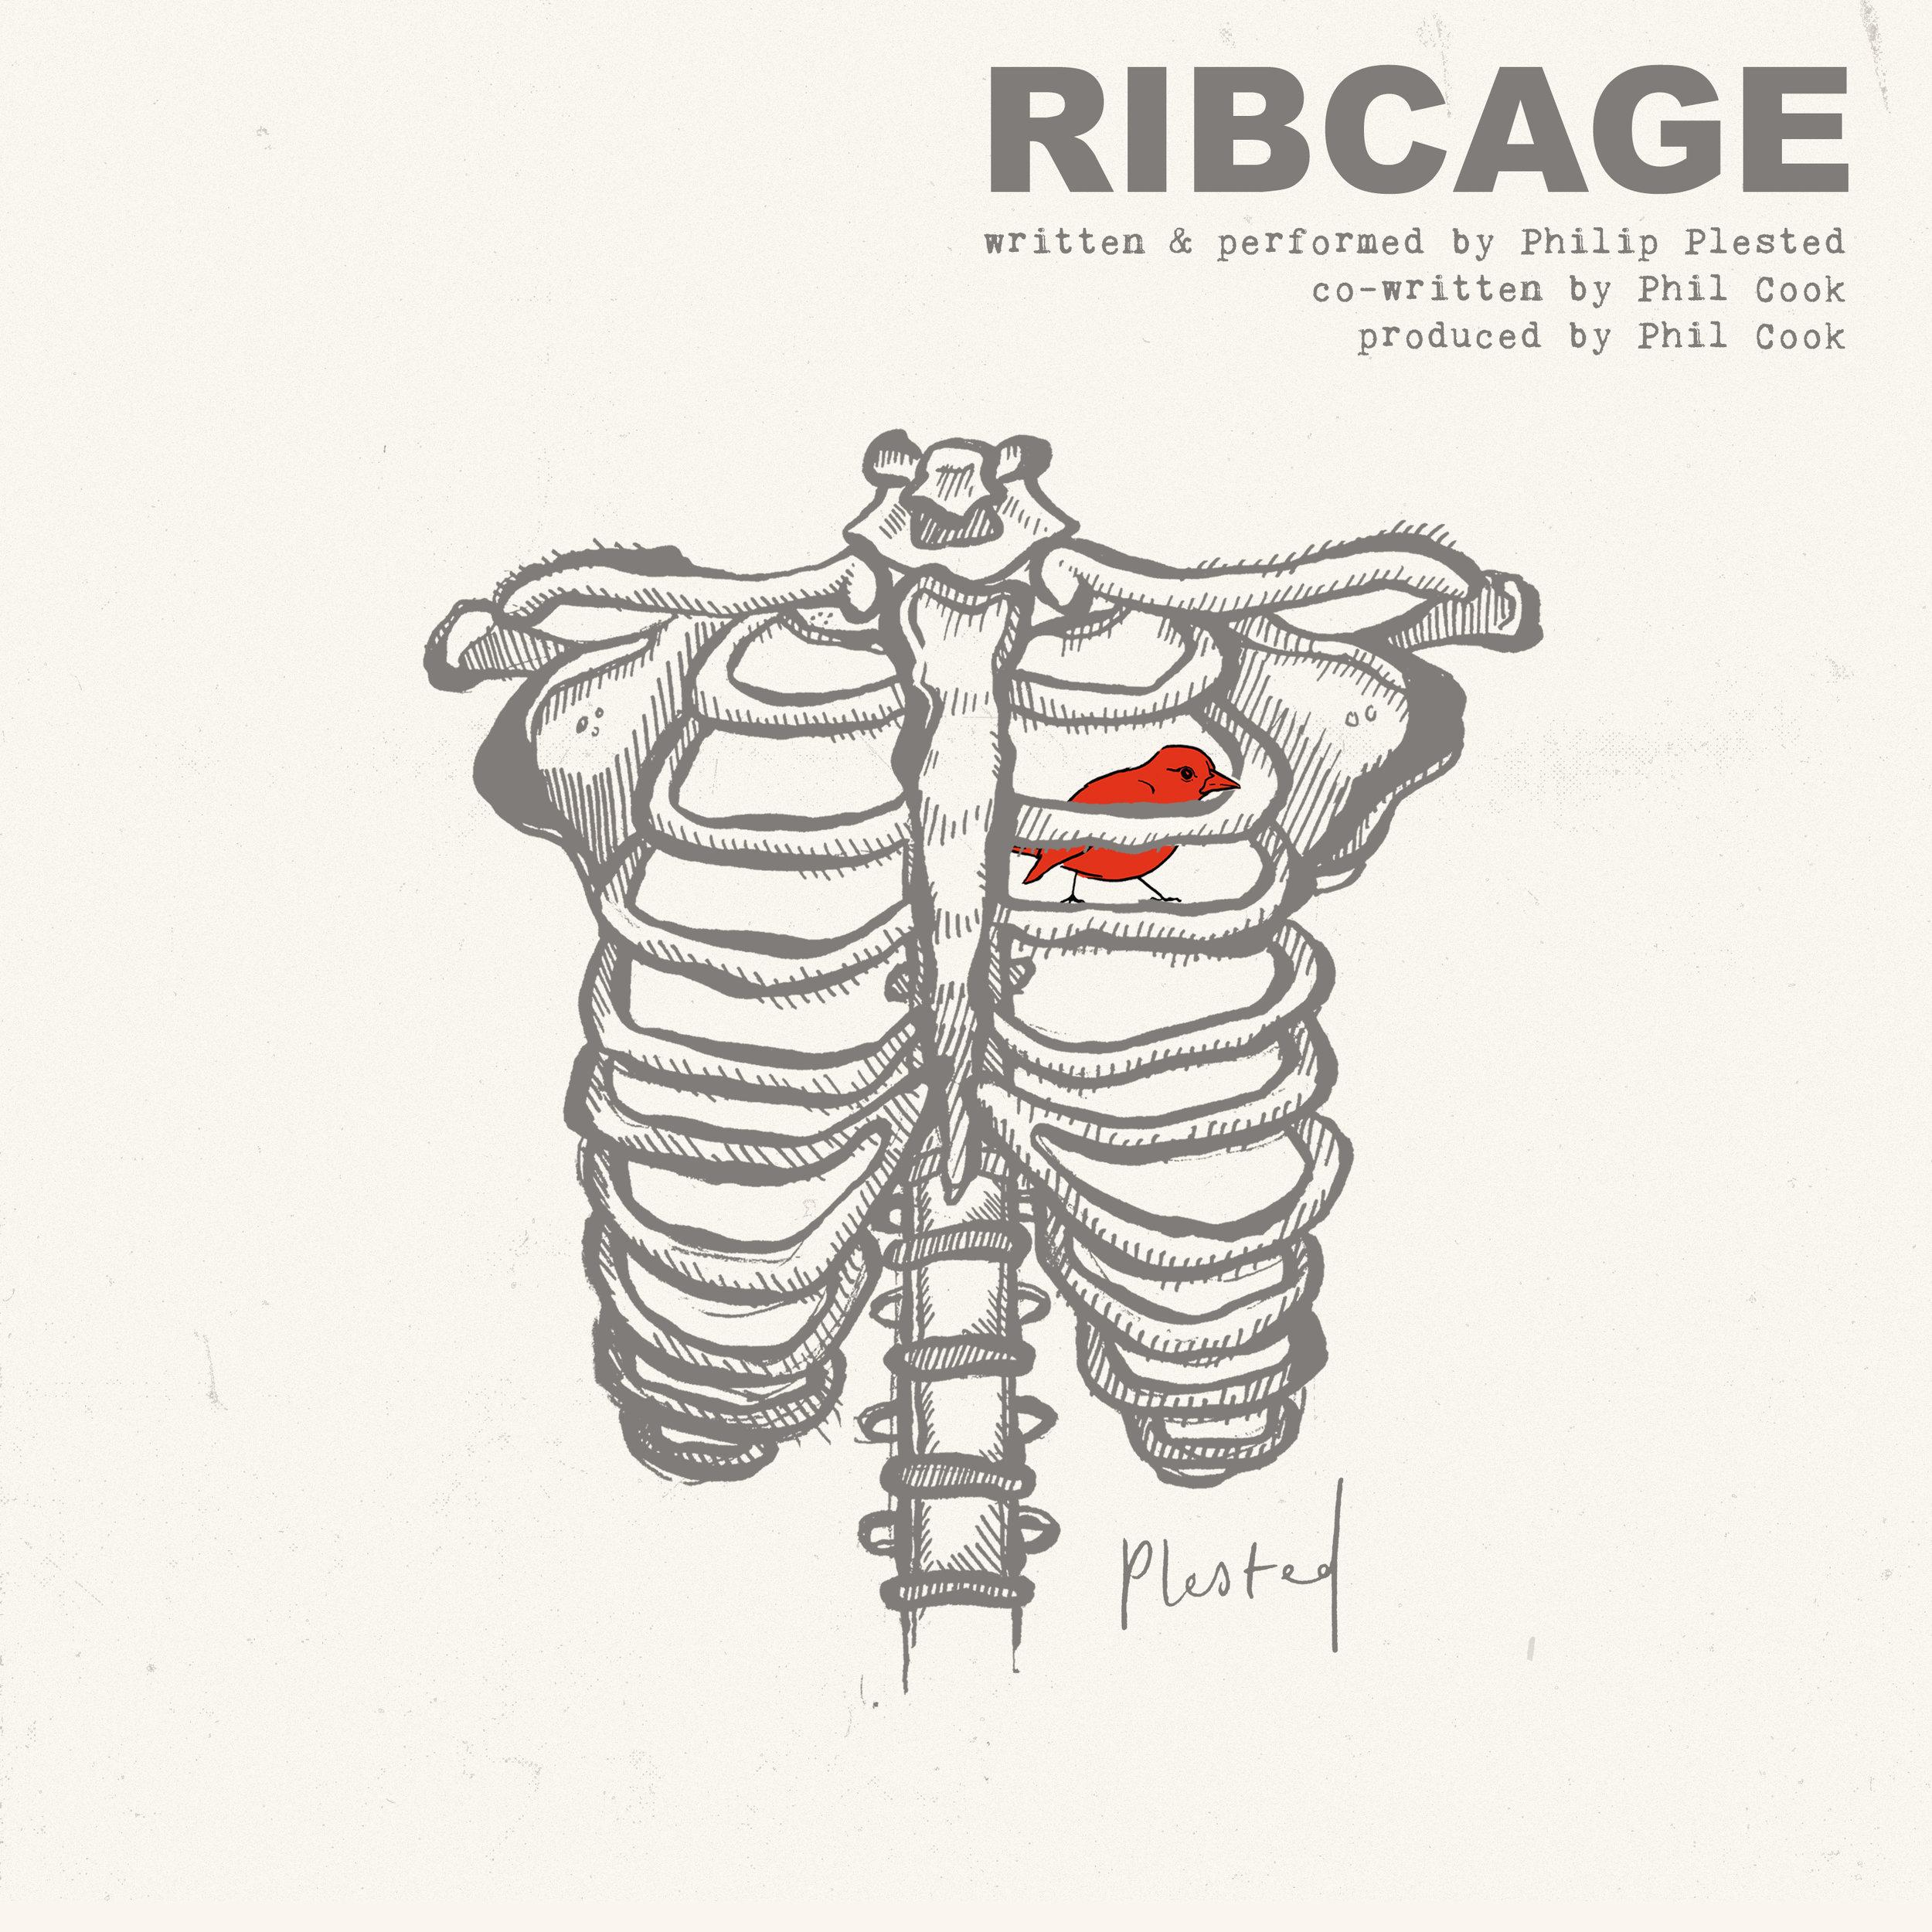 final_ribcage_artwork.jpg